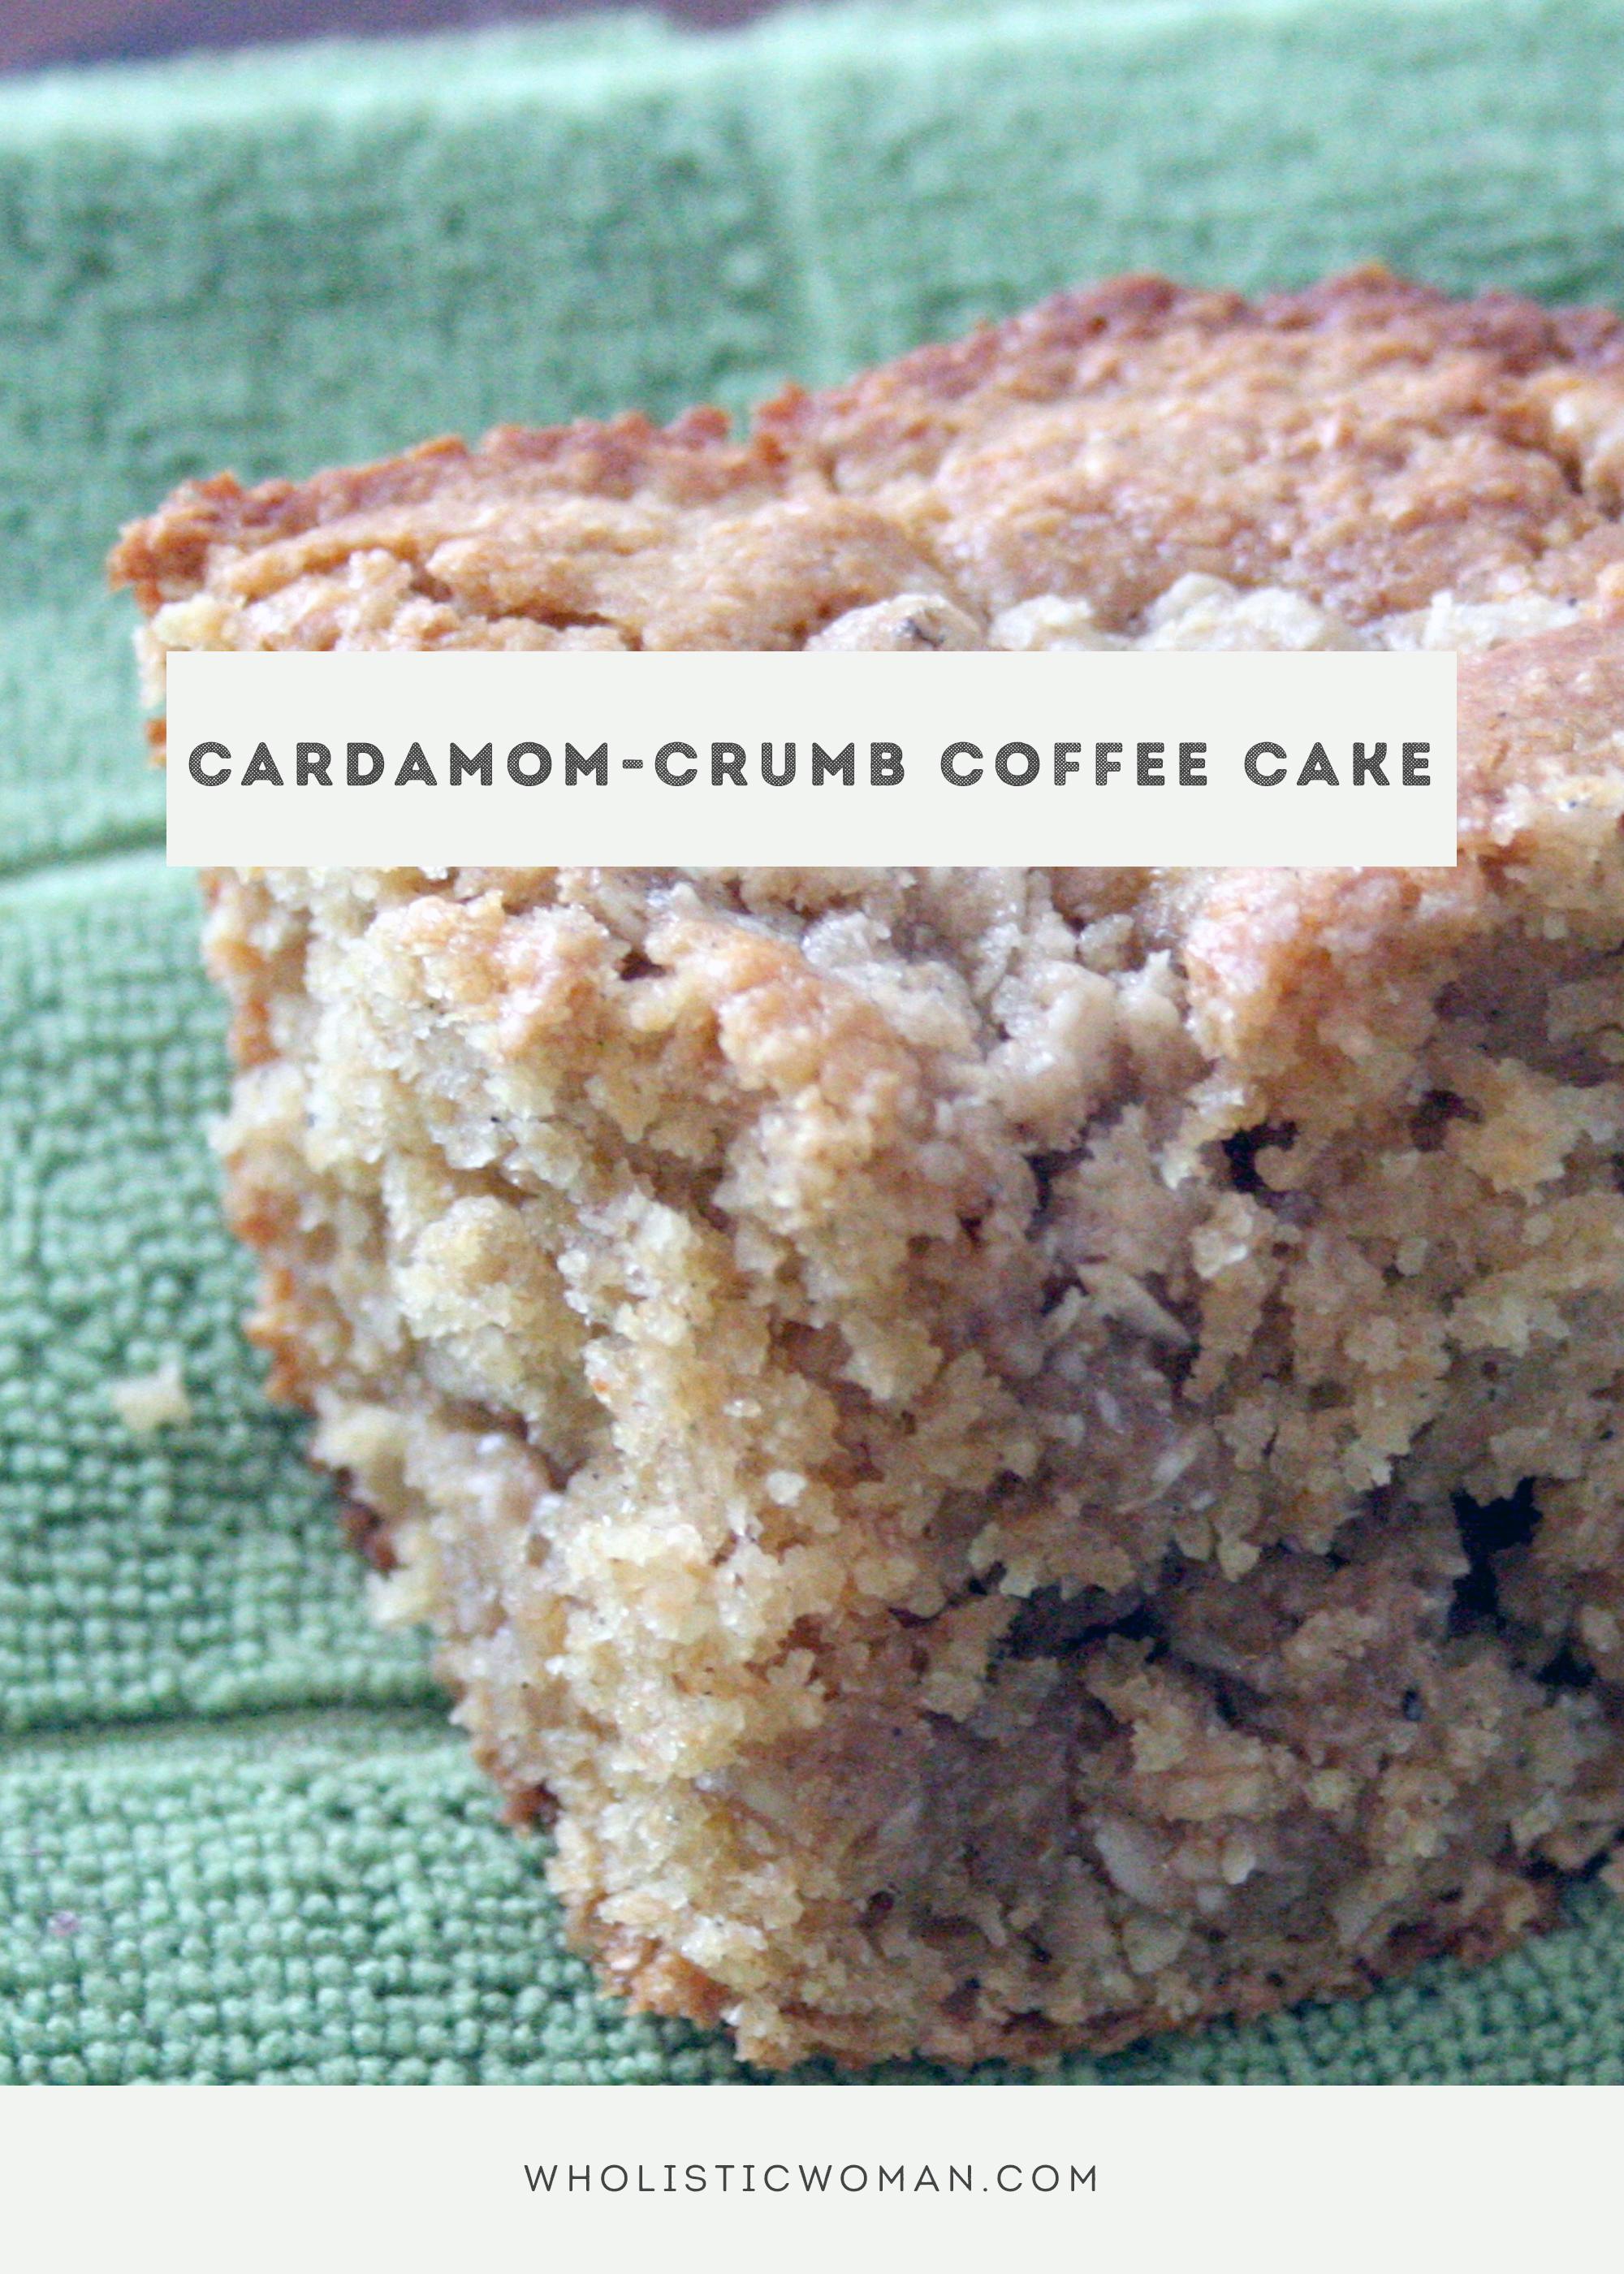 Cardamom-Crumb Coffee Cake for #SundaySupper